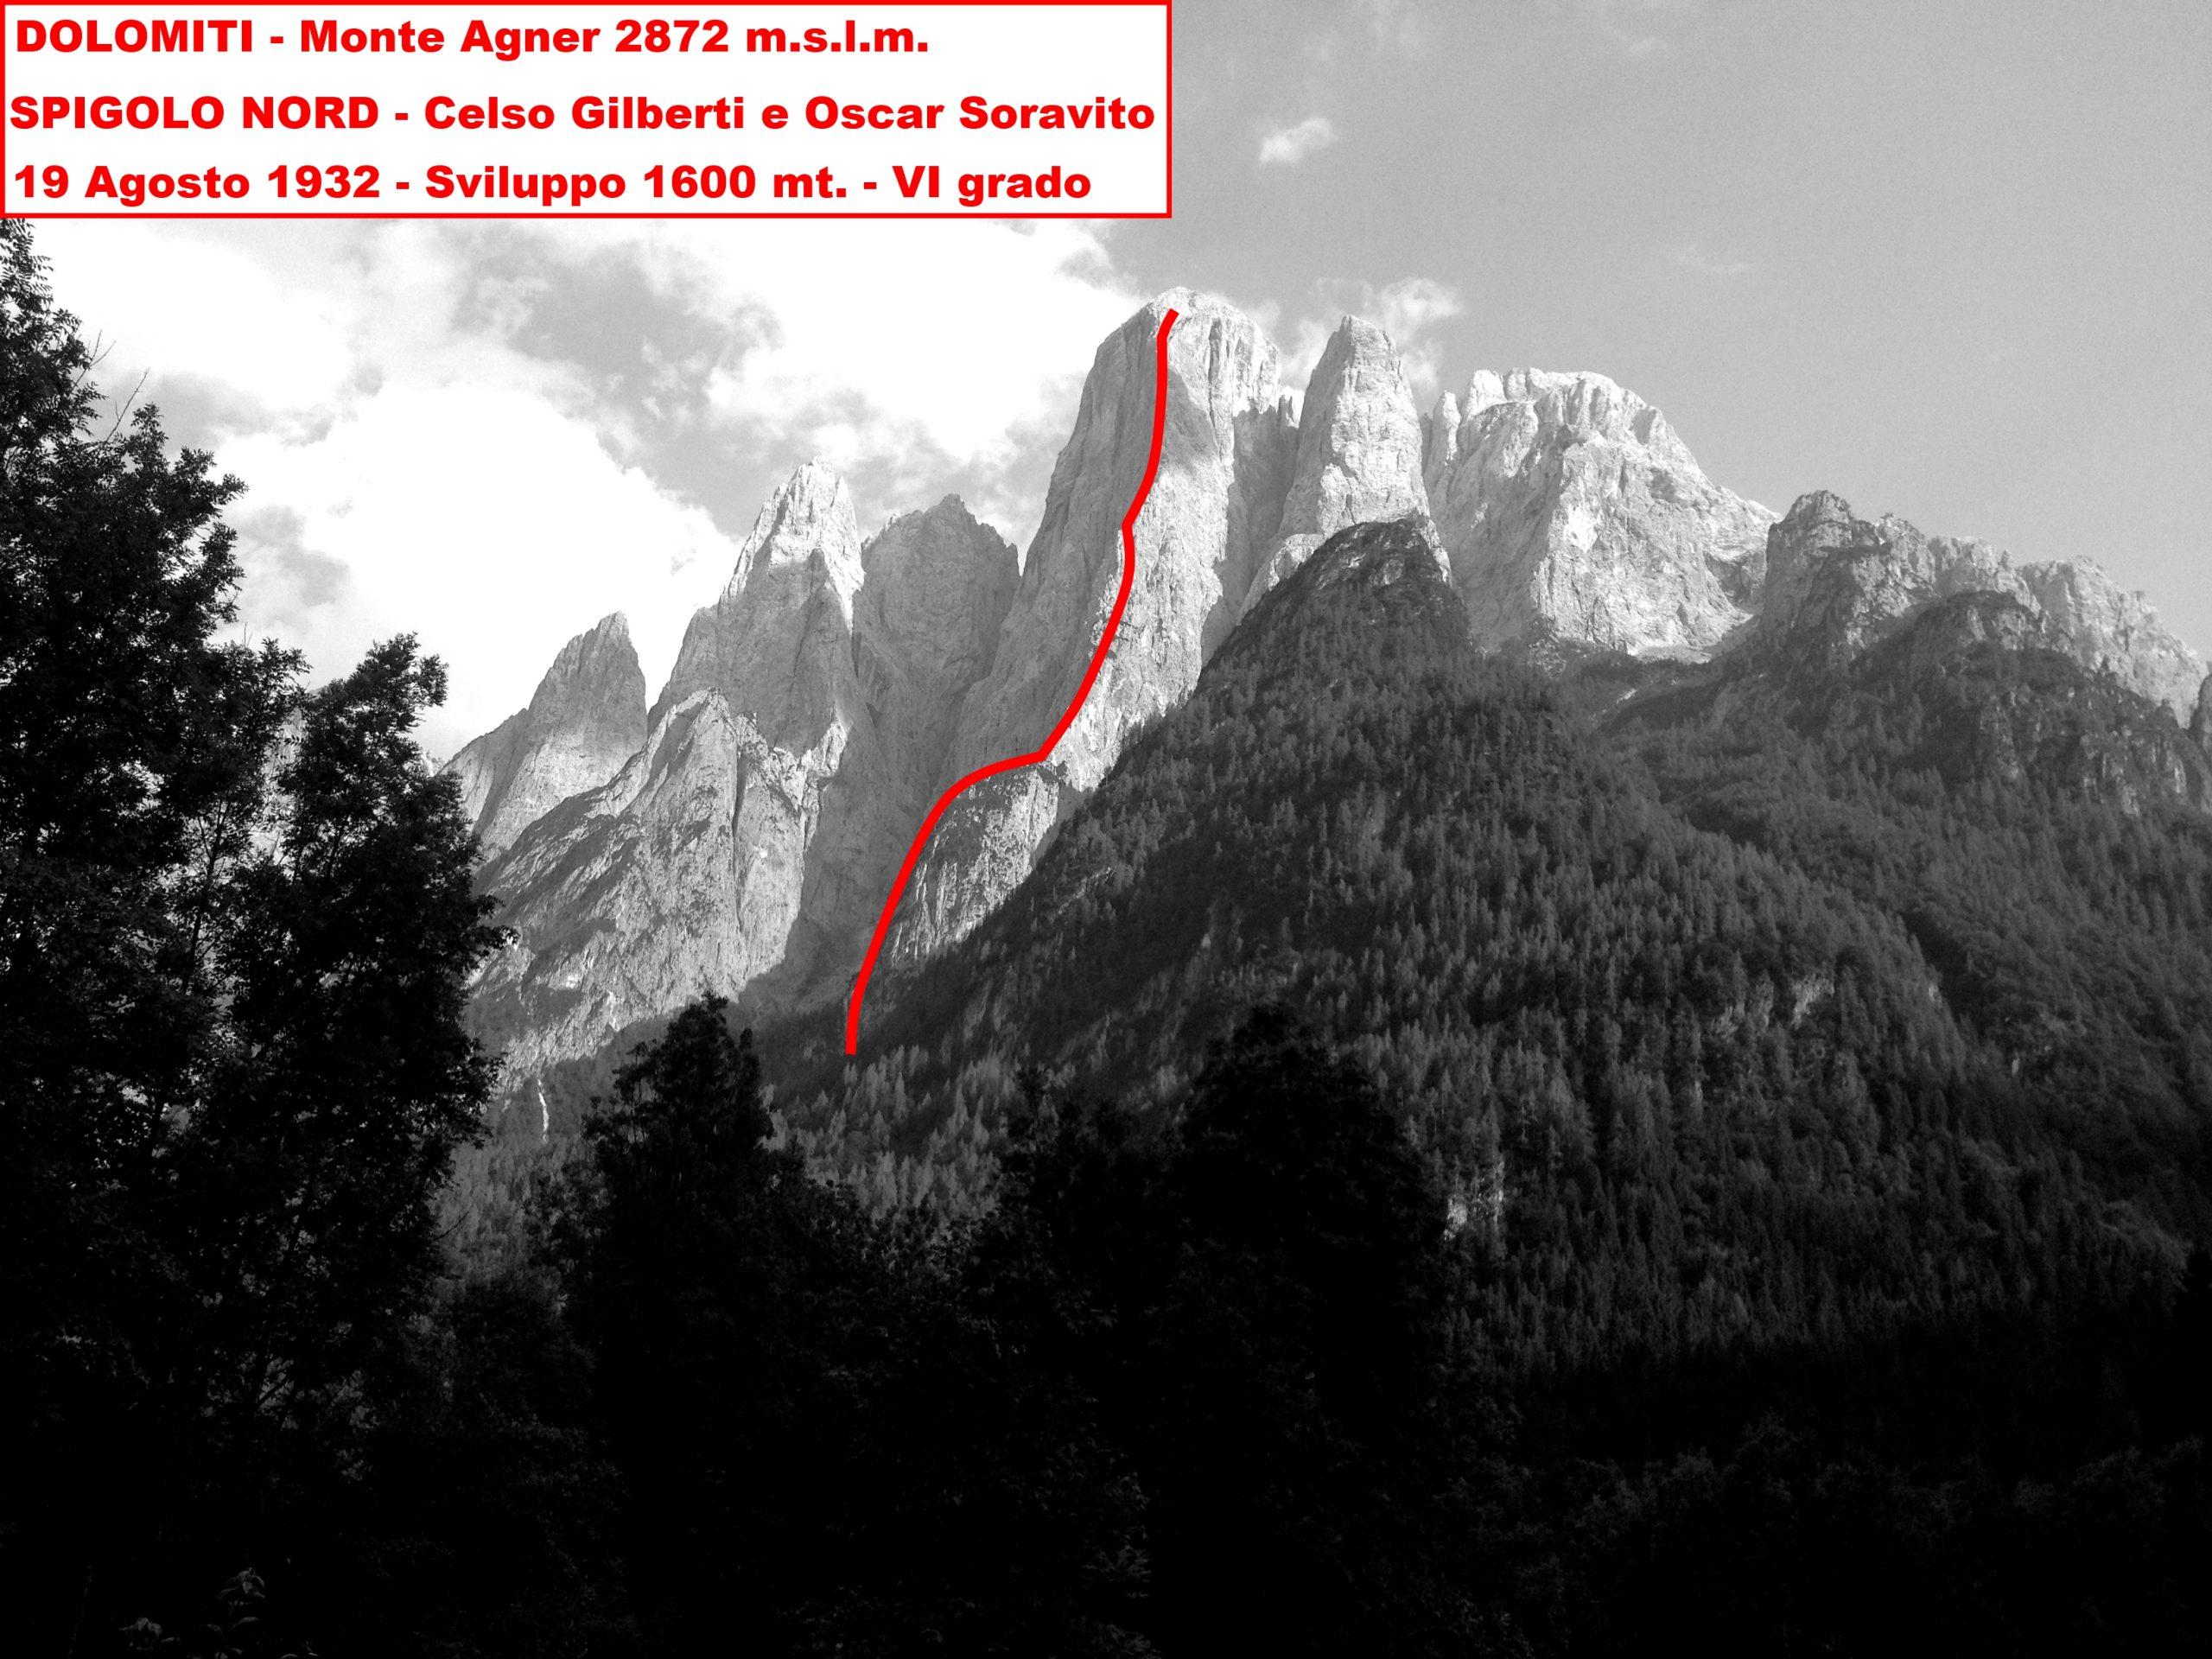 Spigolo Nord of Mount agner